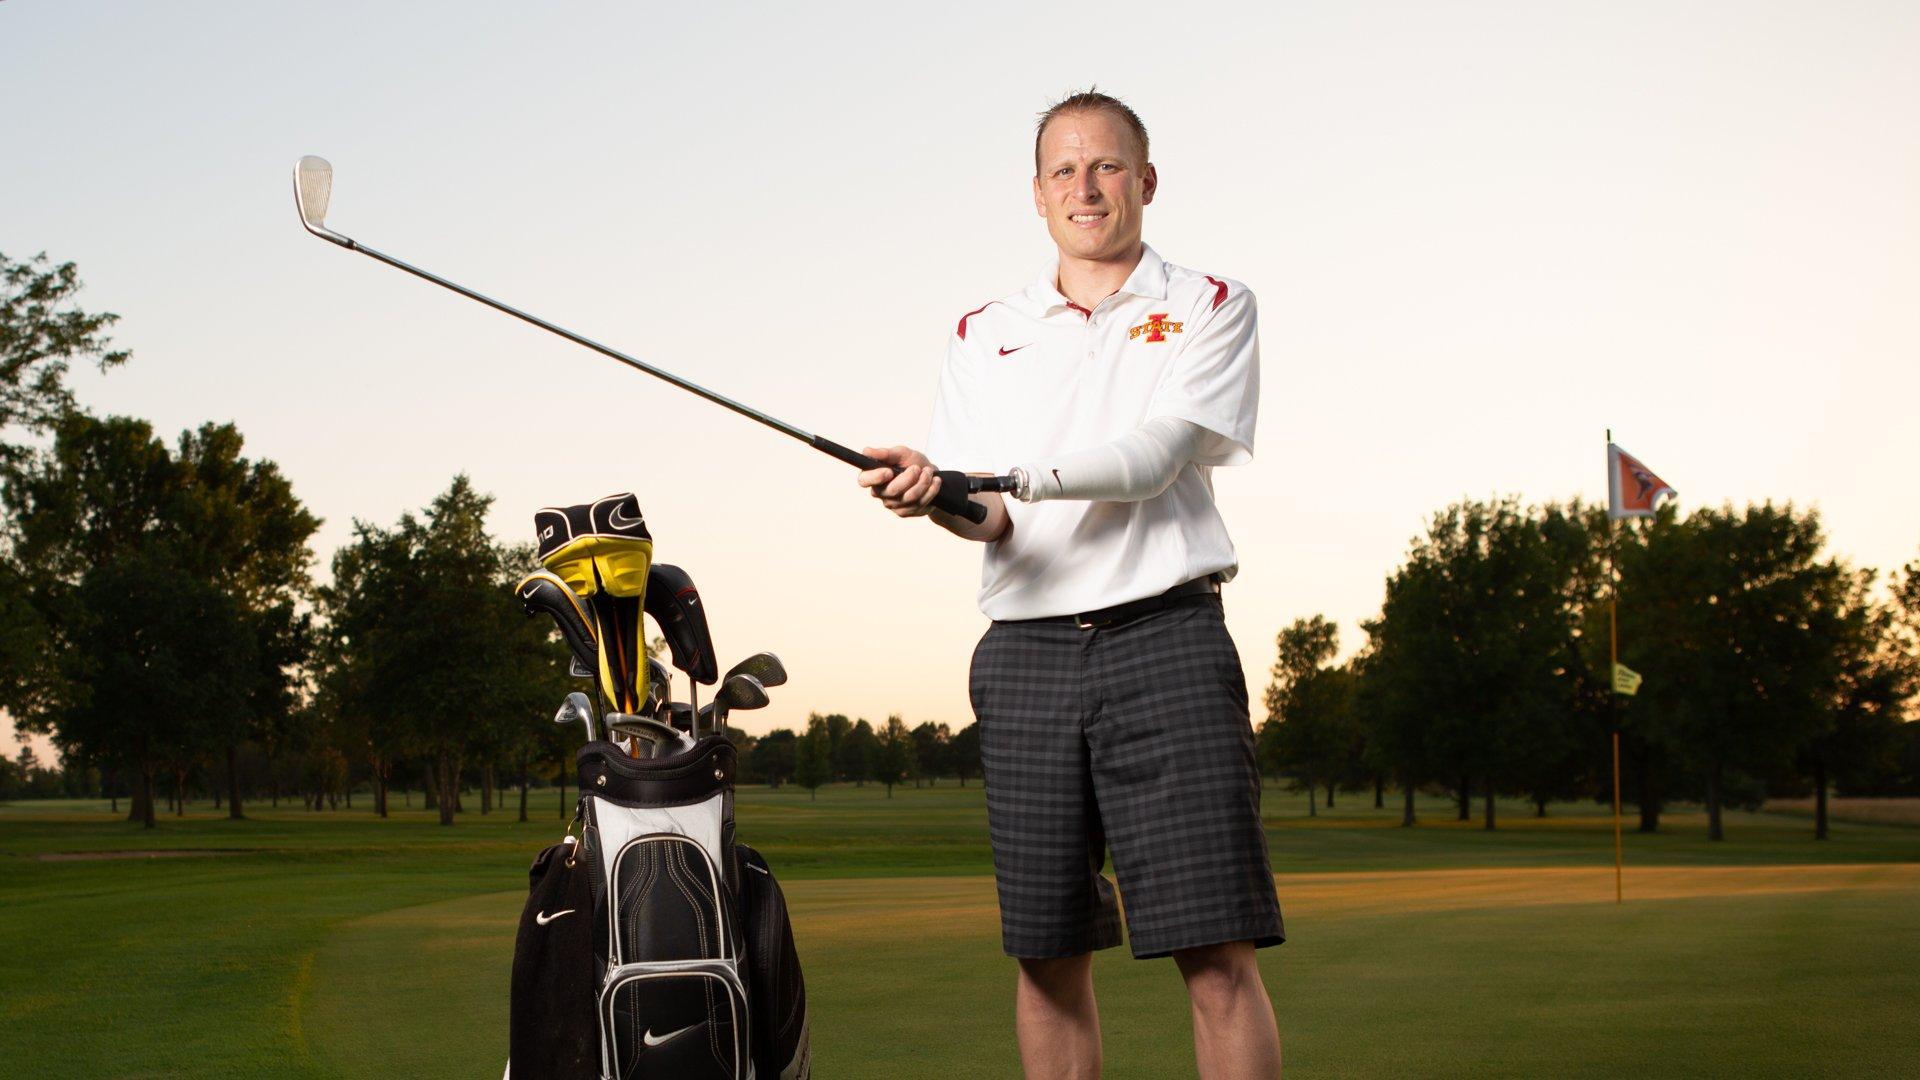 Custom golf prosthesis